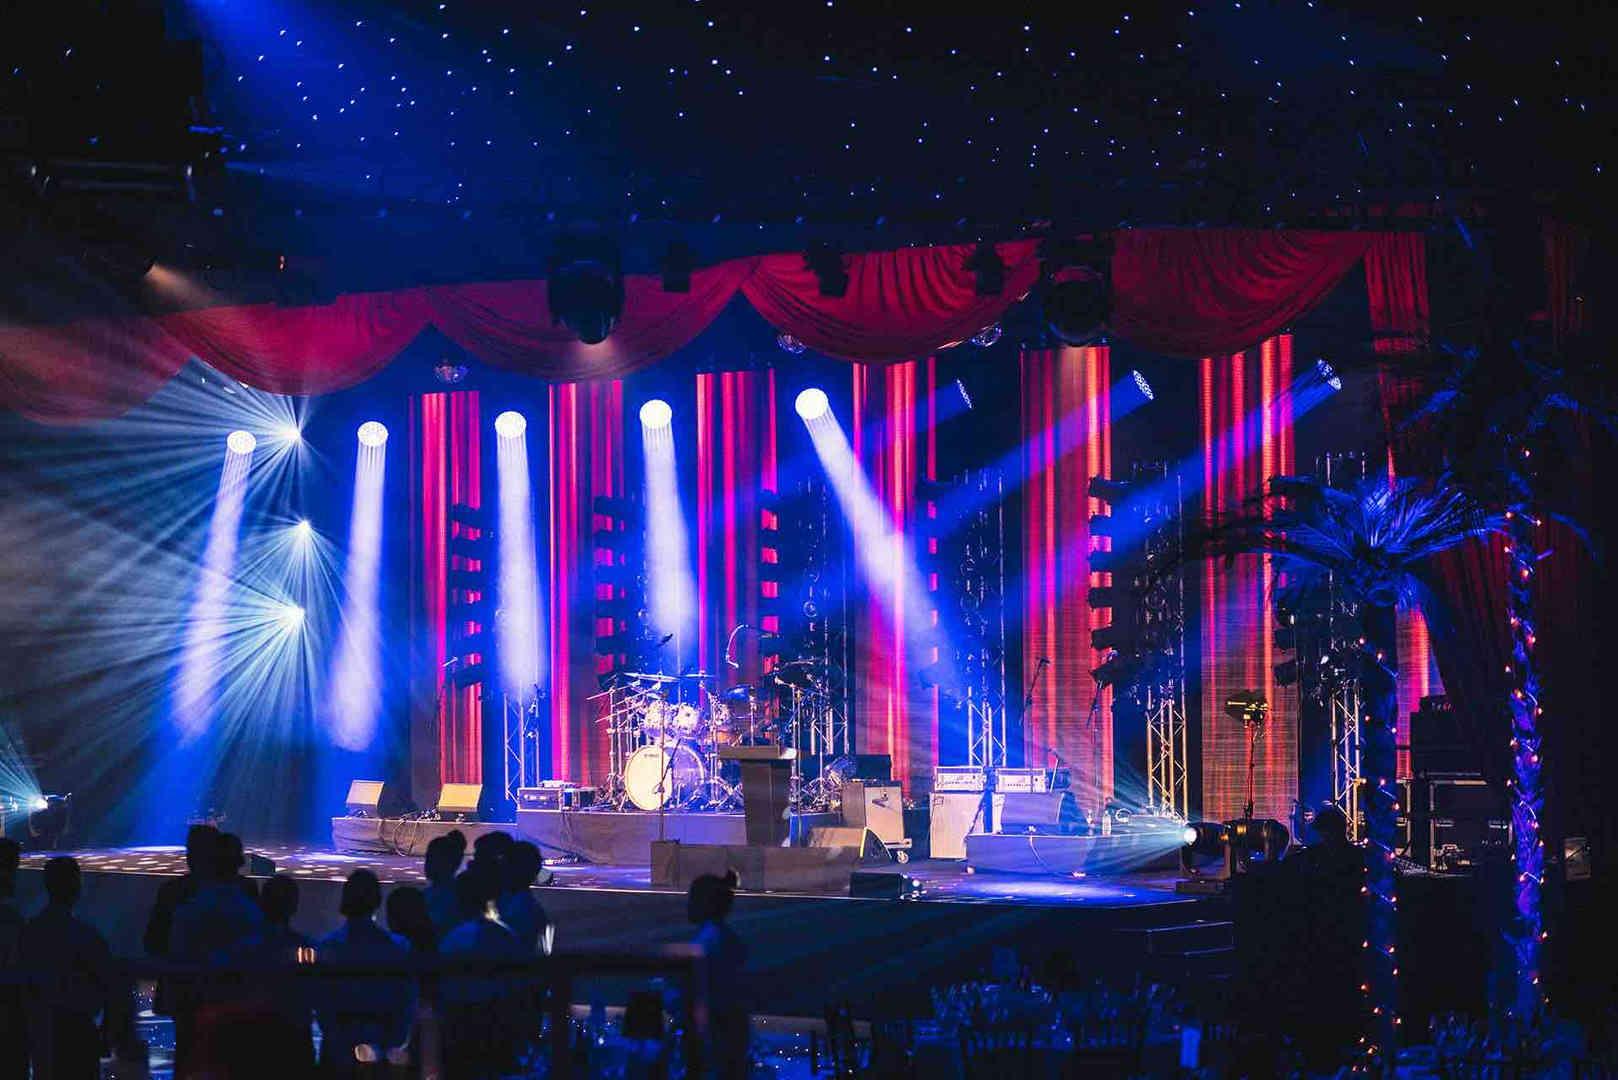 0125 Awardshow Lighting Equipment London